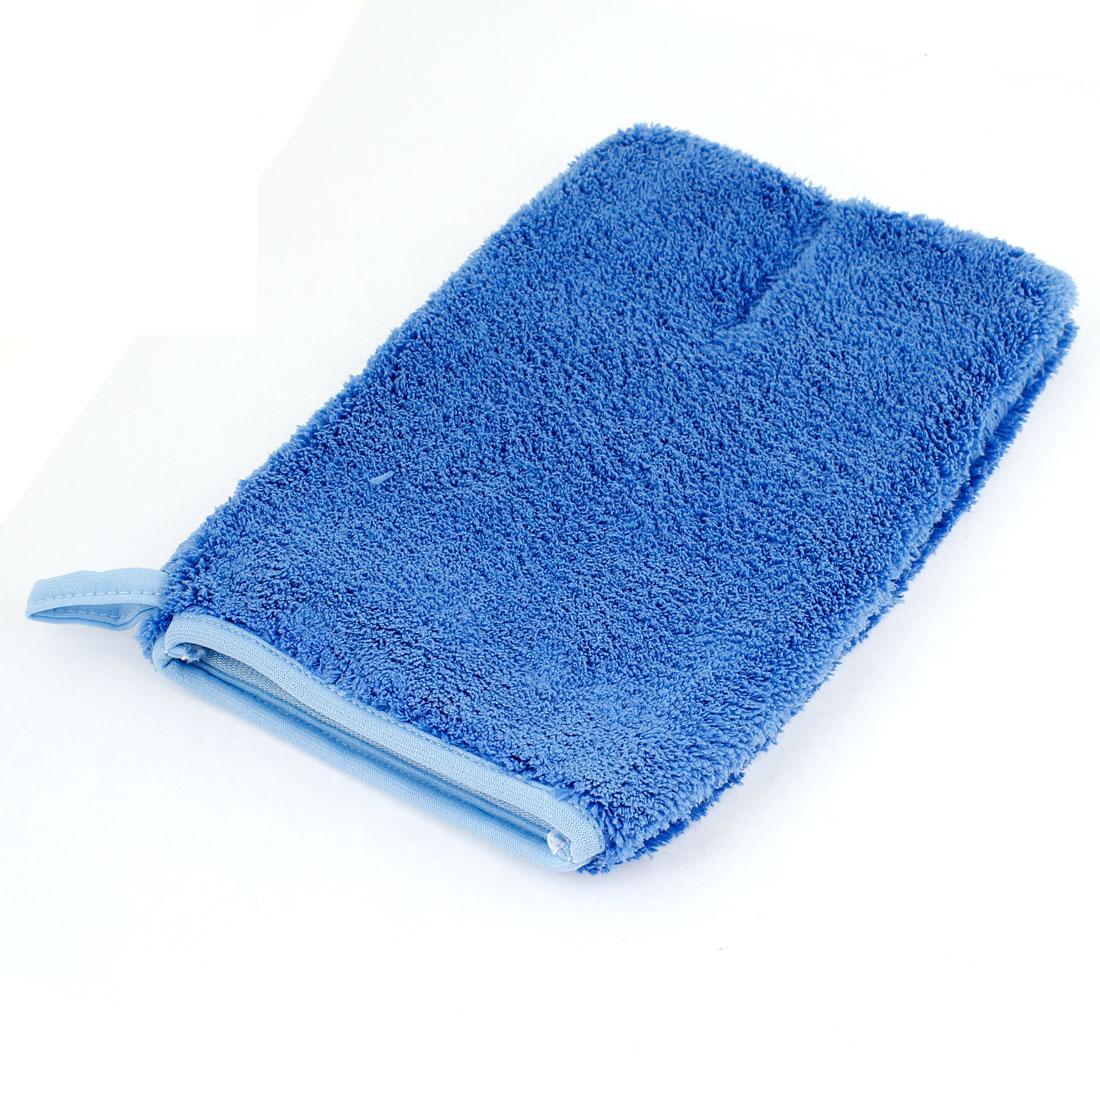 Vehicle Car Washing Cleaning Glove Blue Soft Plush Auto Wash Mitt